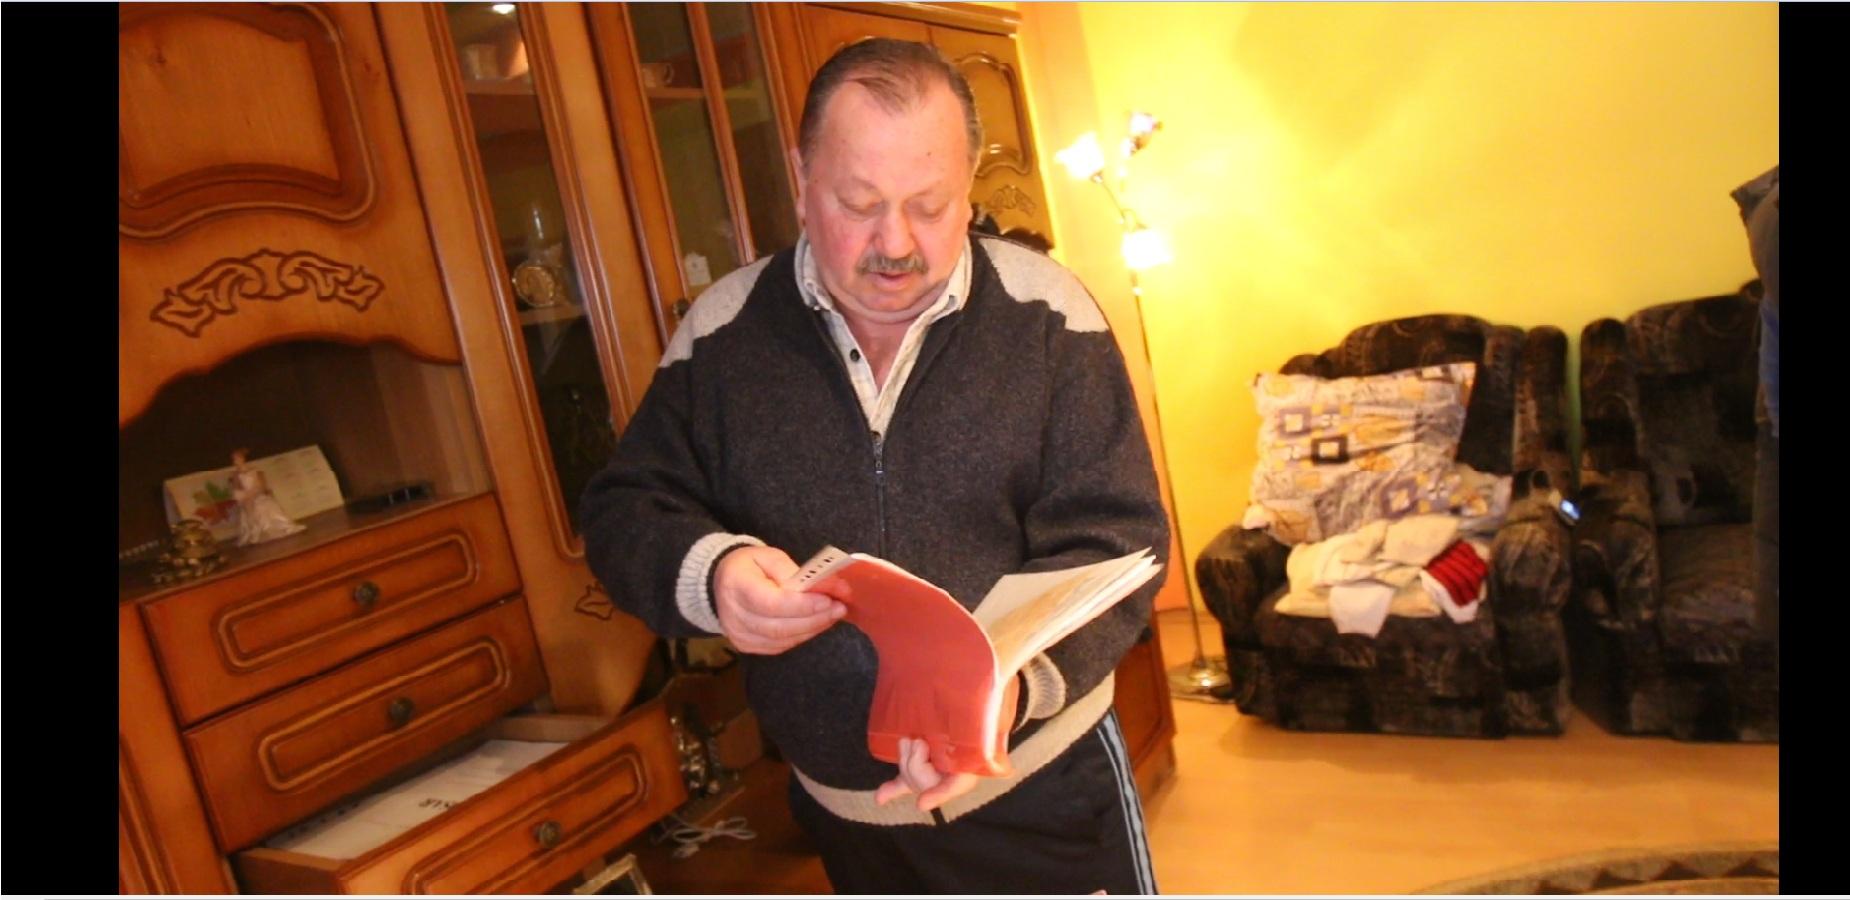 Eugeniu Cristea spera ca va reusi sa stranga banii necesari pentru operatie